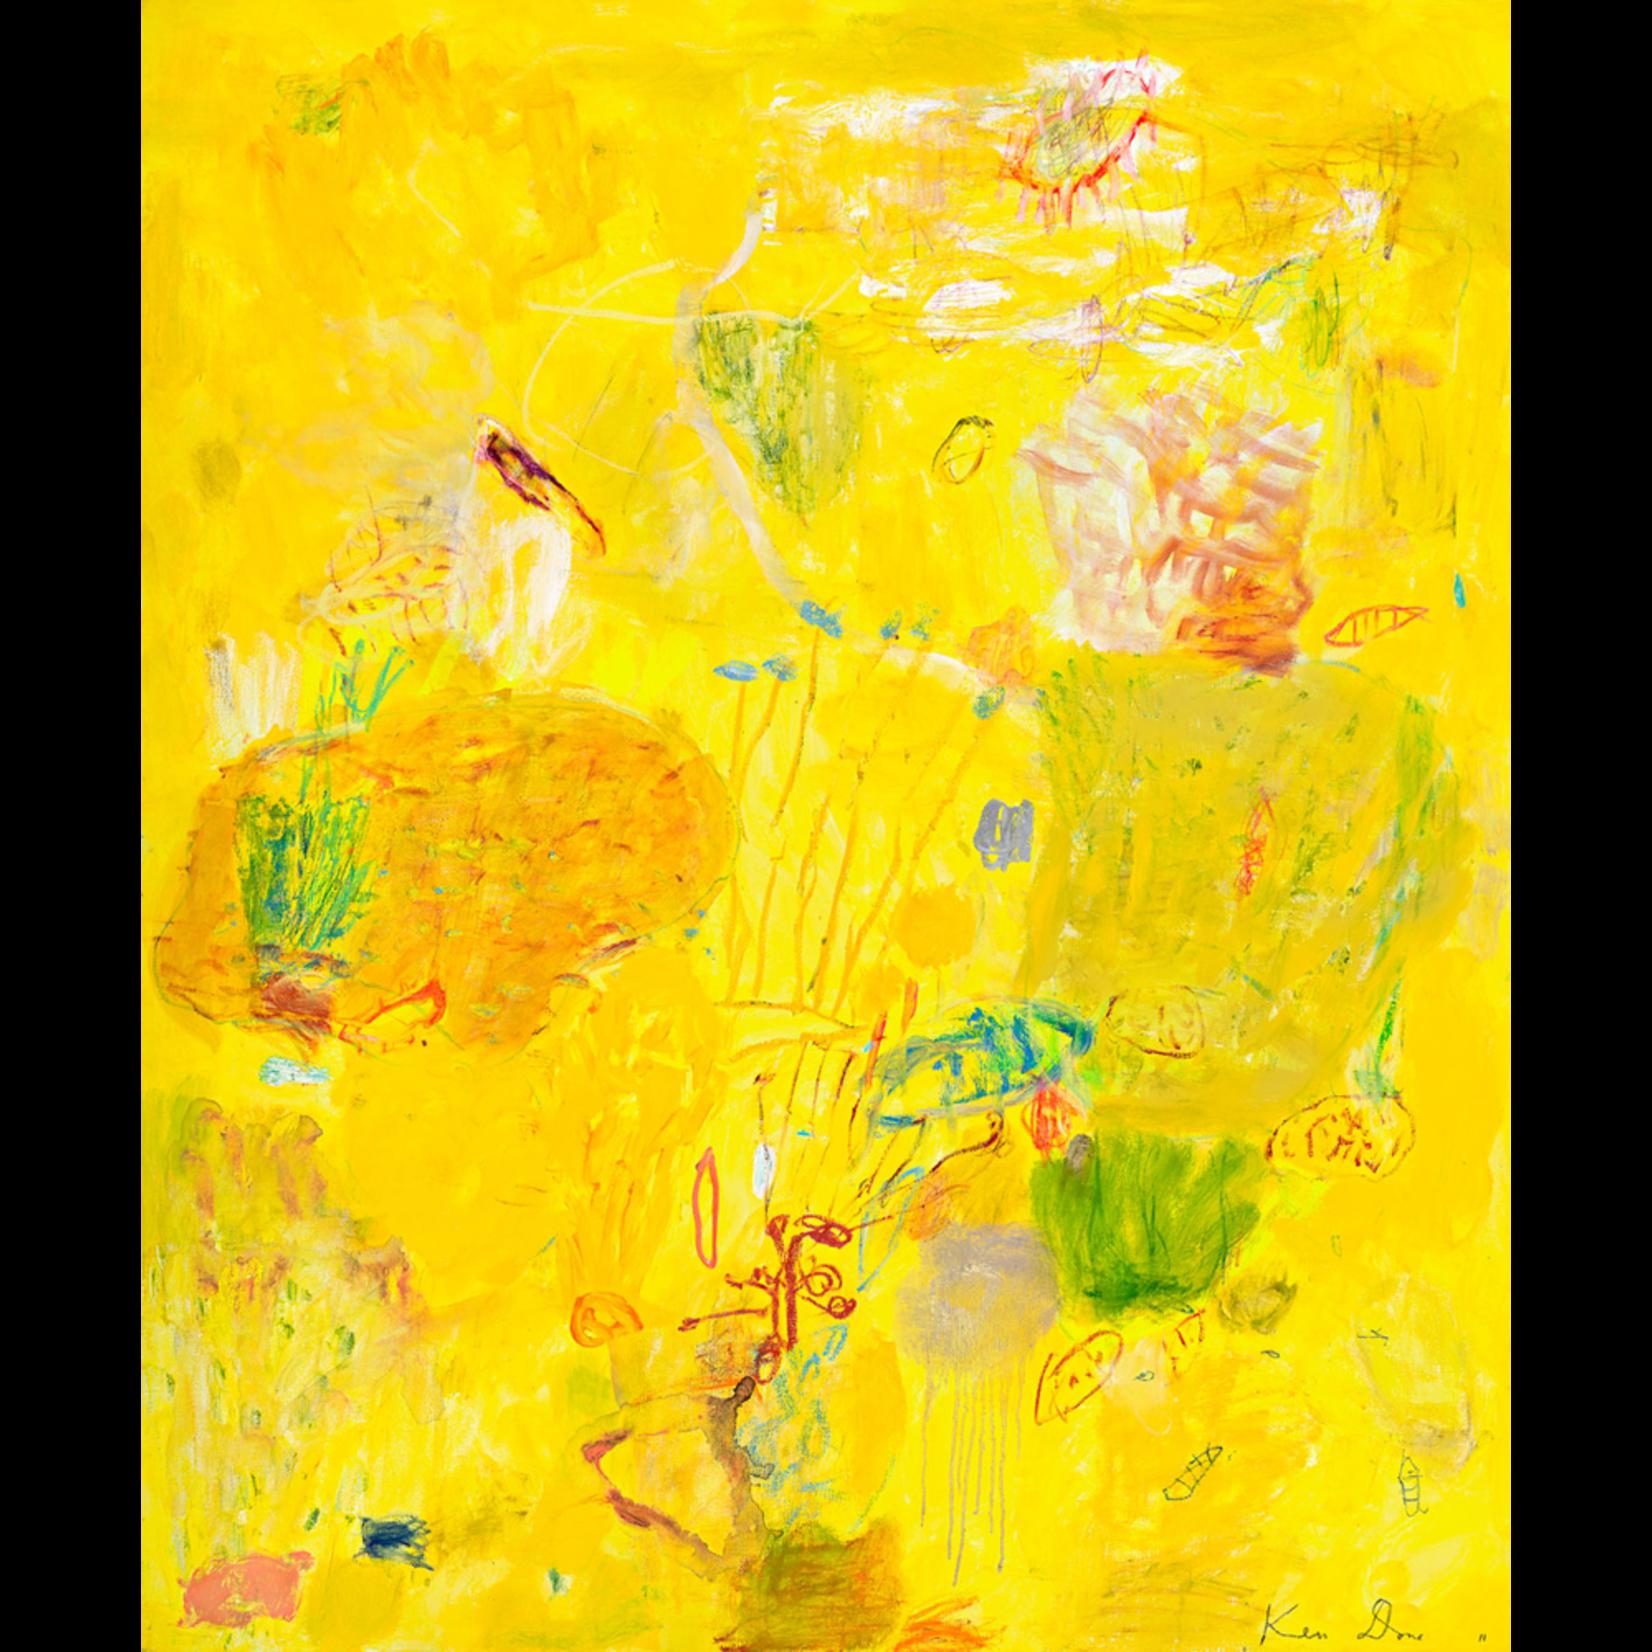 Limited Edition Prints Cadmium sea garden, 2011